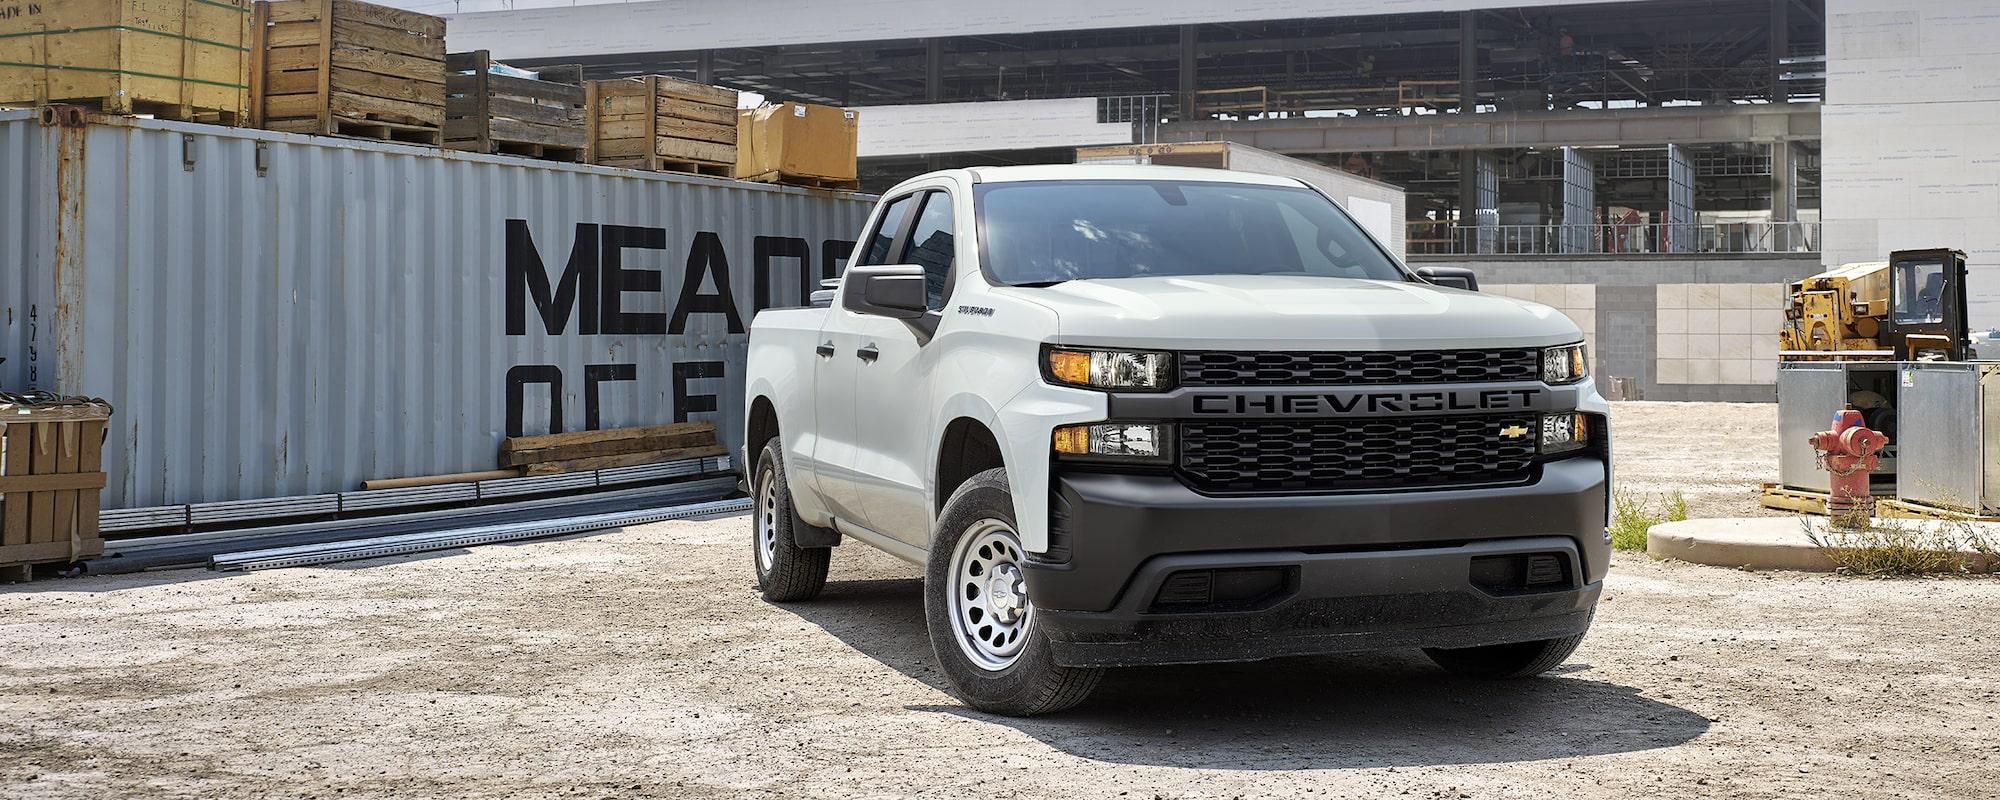 2019 silverado commercial work truck [ 2048 x 819 Pixel ]